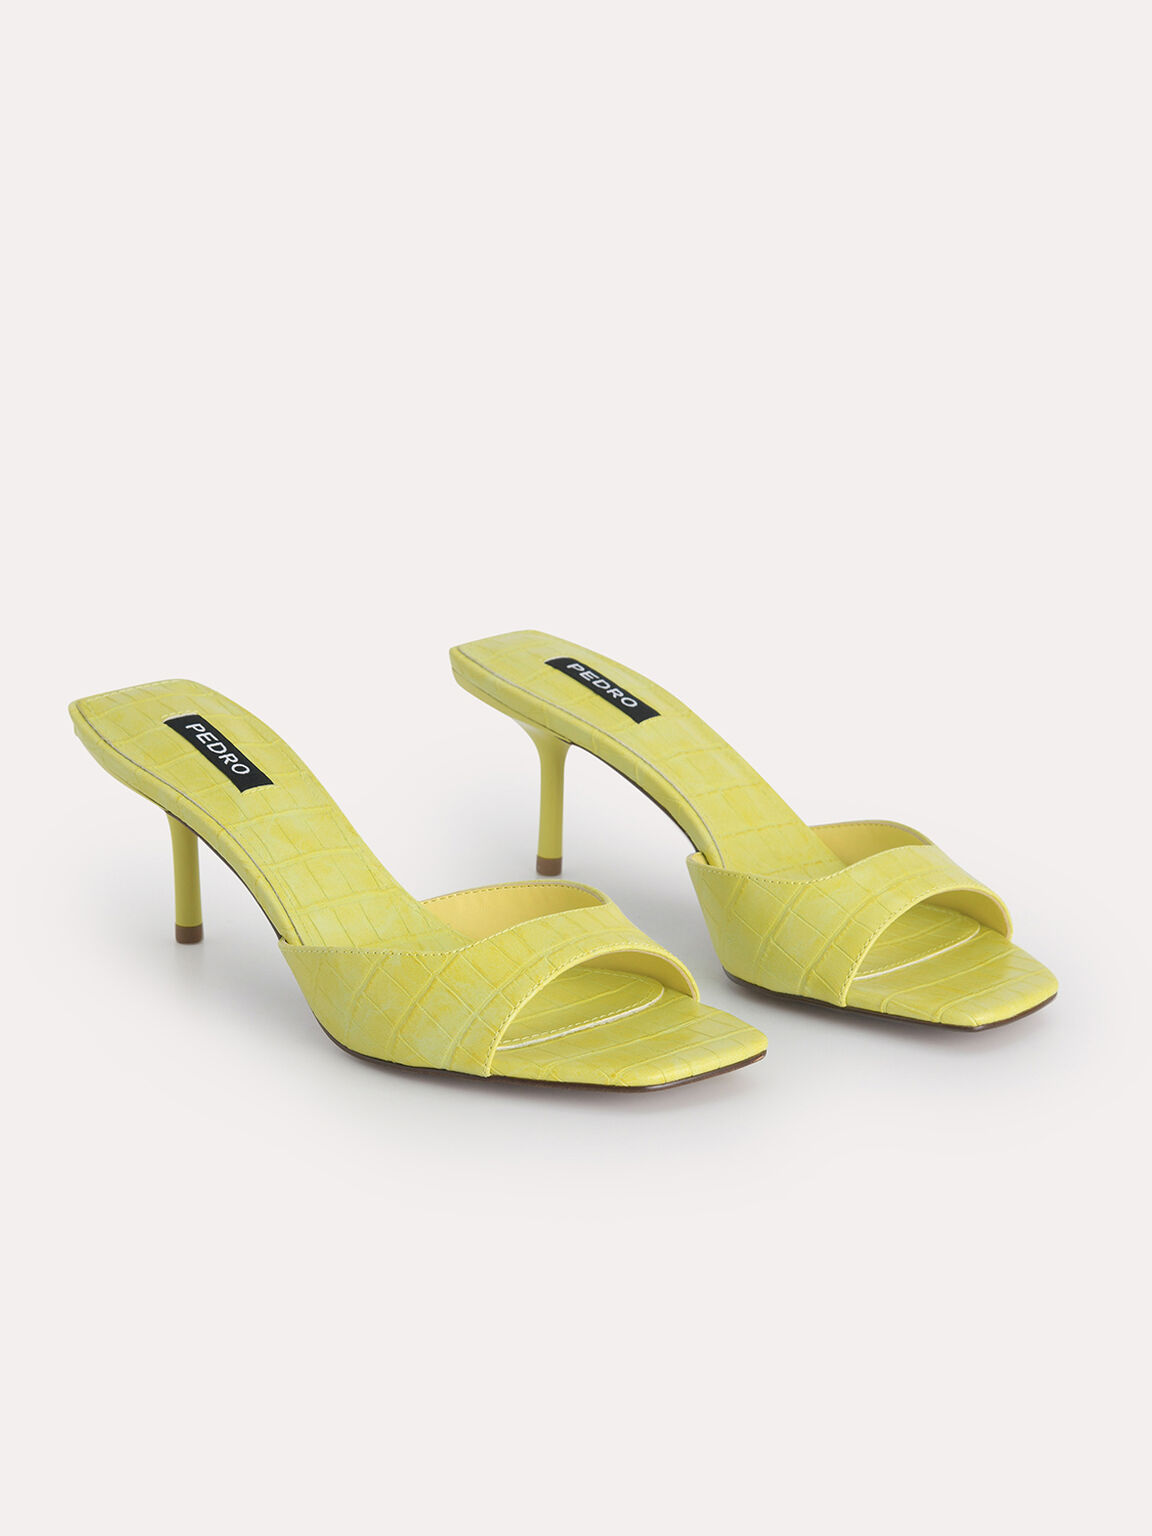 Croc-Effect Heeled Sandals, Yellow, hi-res